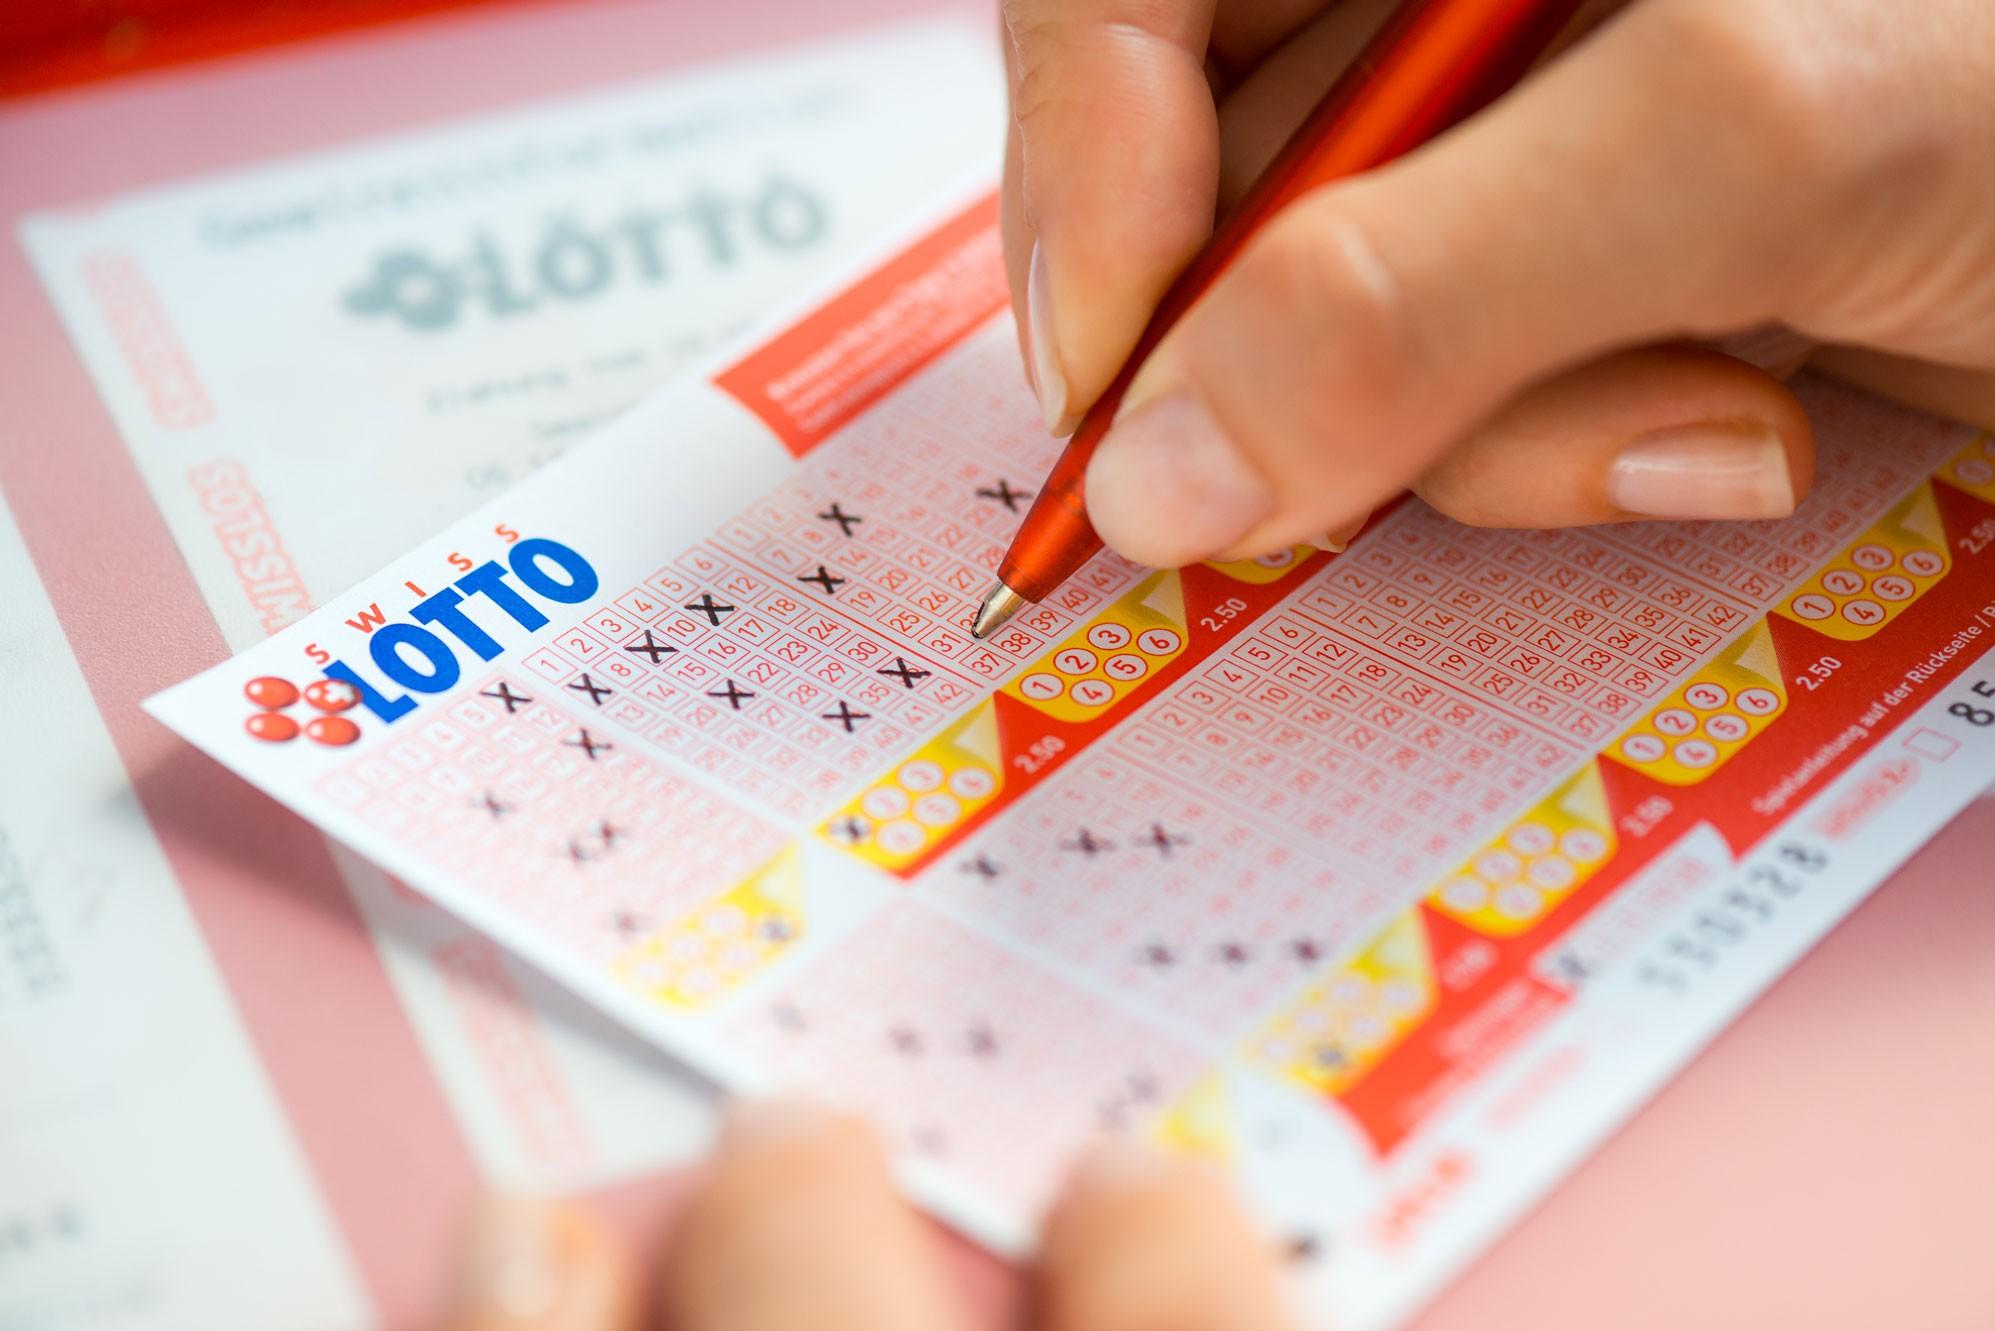 Resultados oficiais de veikkaus - números vencedores da loteria finlandesa